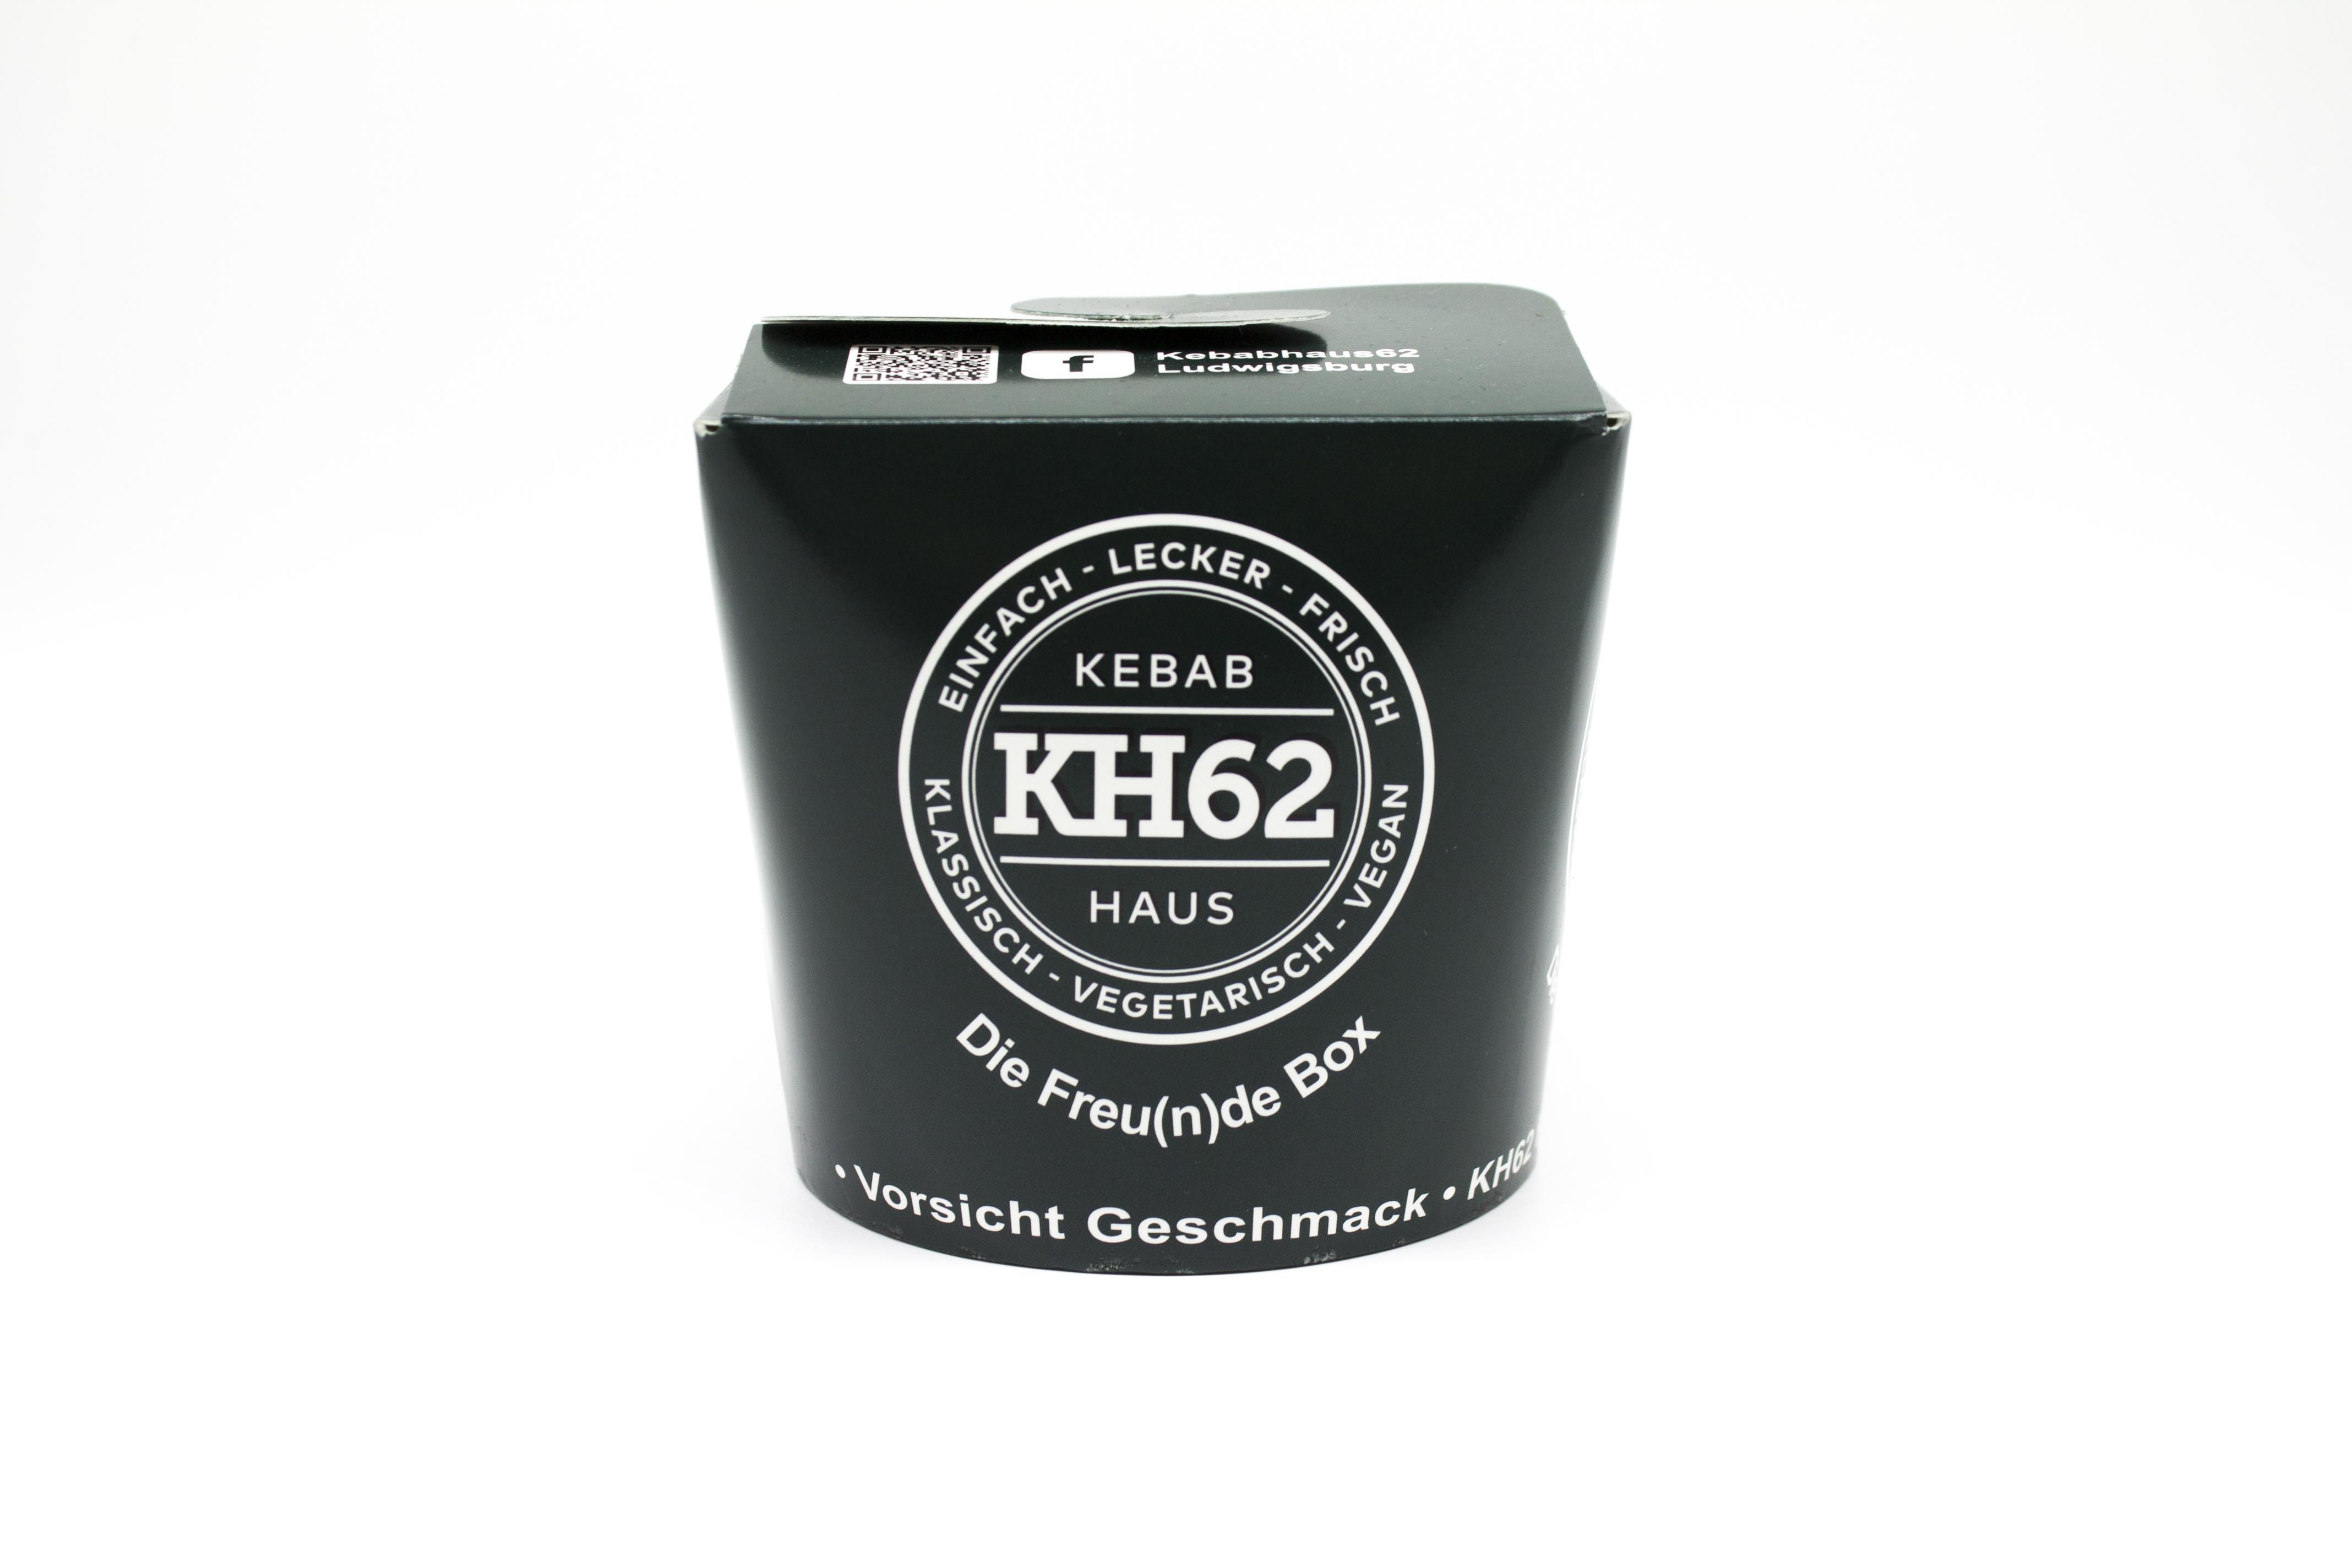 KGH62